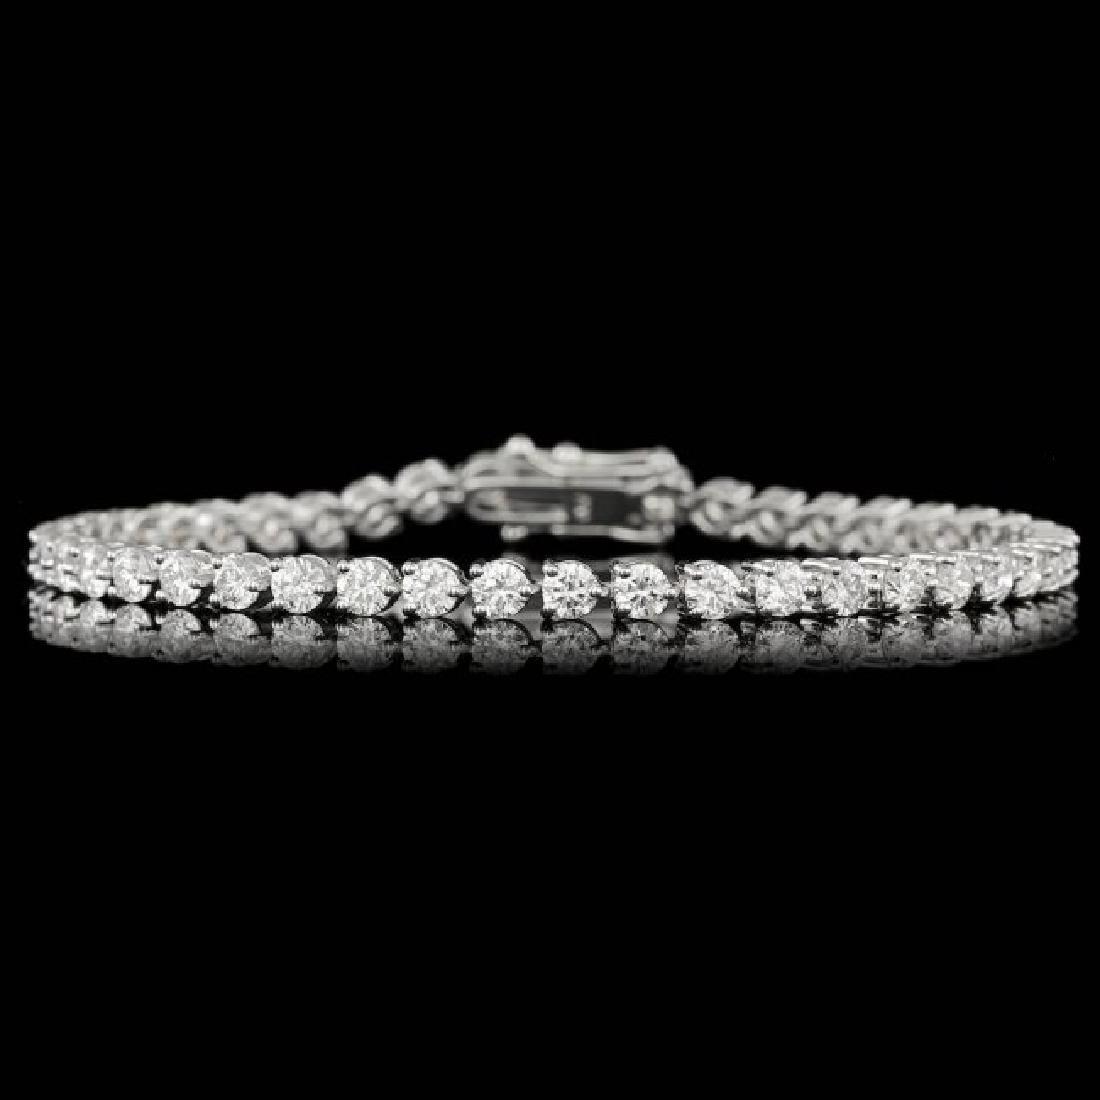 18k White Gold 6.25ct Diamond Bracelet